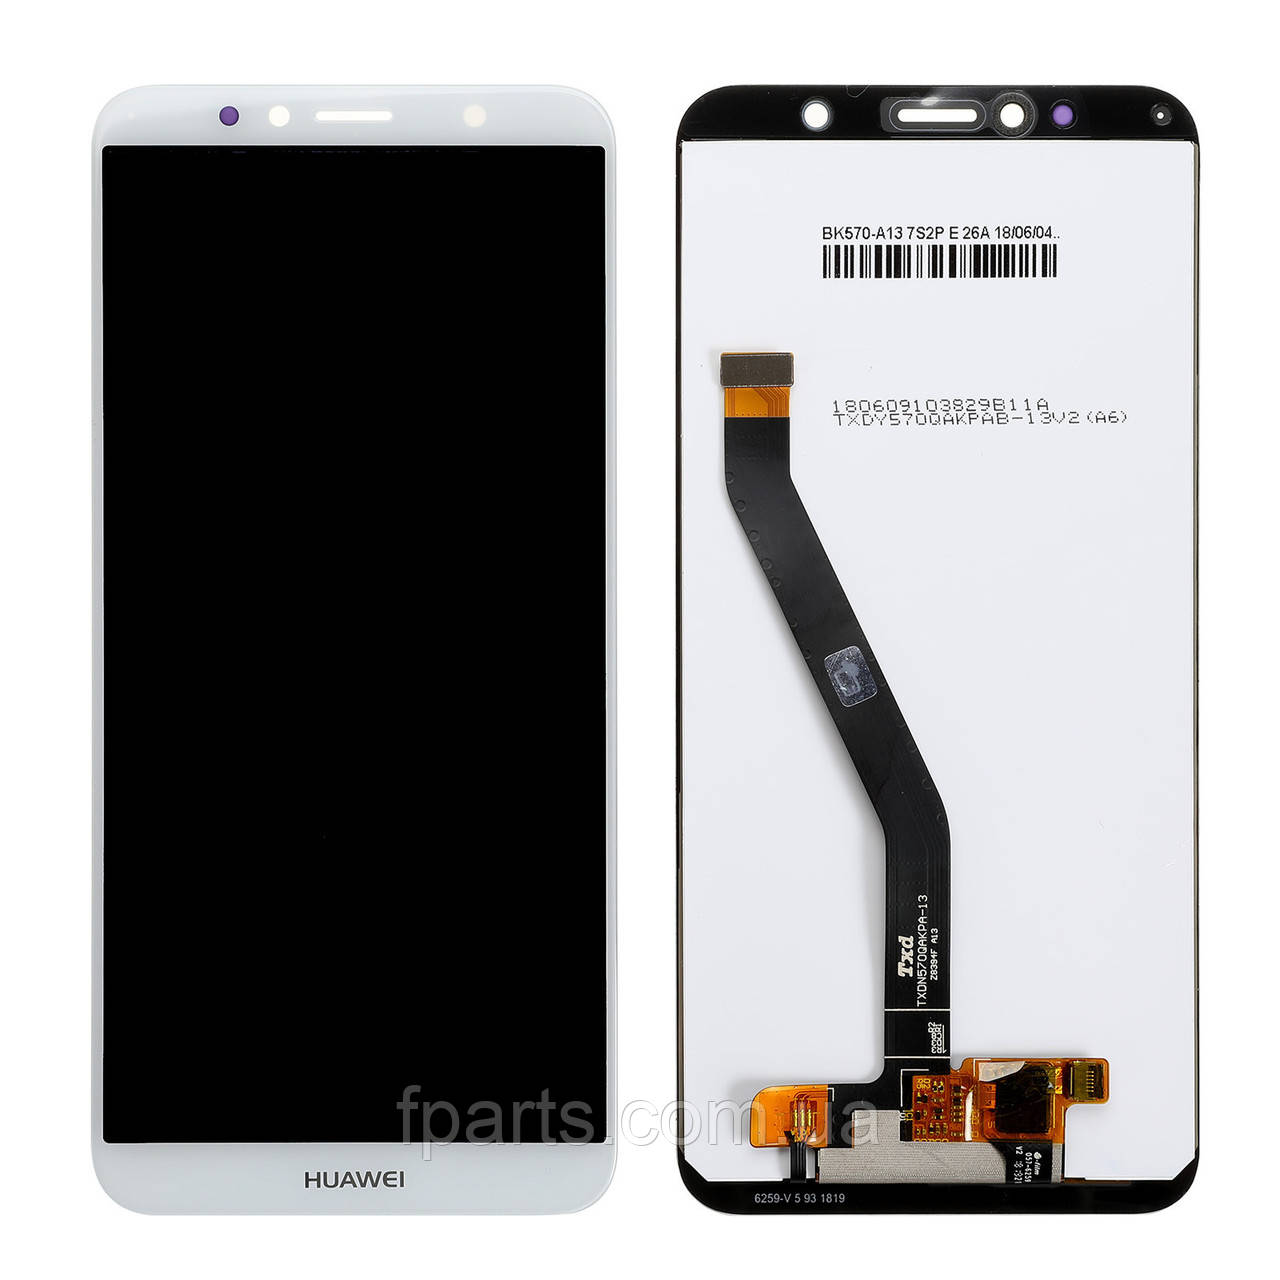 Дисплей для Huawei Y6 2018 (ATU-L21) Y6 Prime 2018 (ATU-L31) с тачскрином, White (Original PRC)